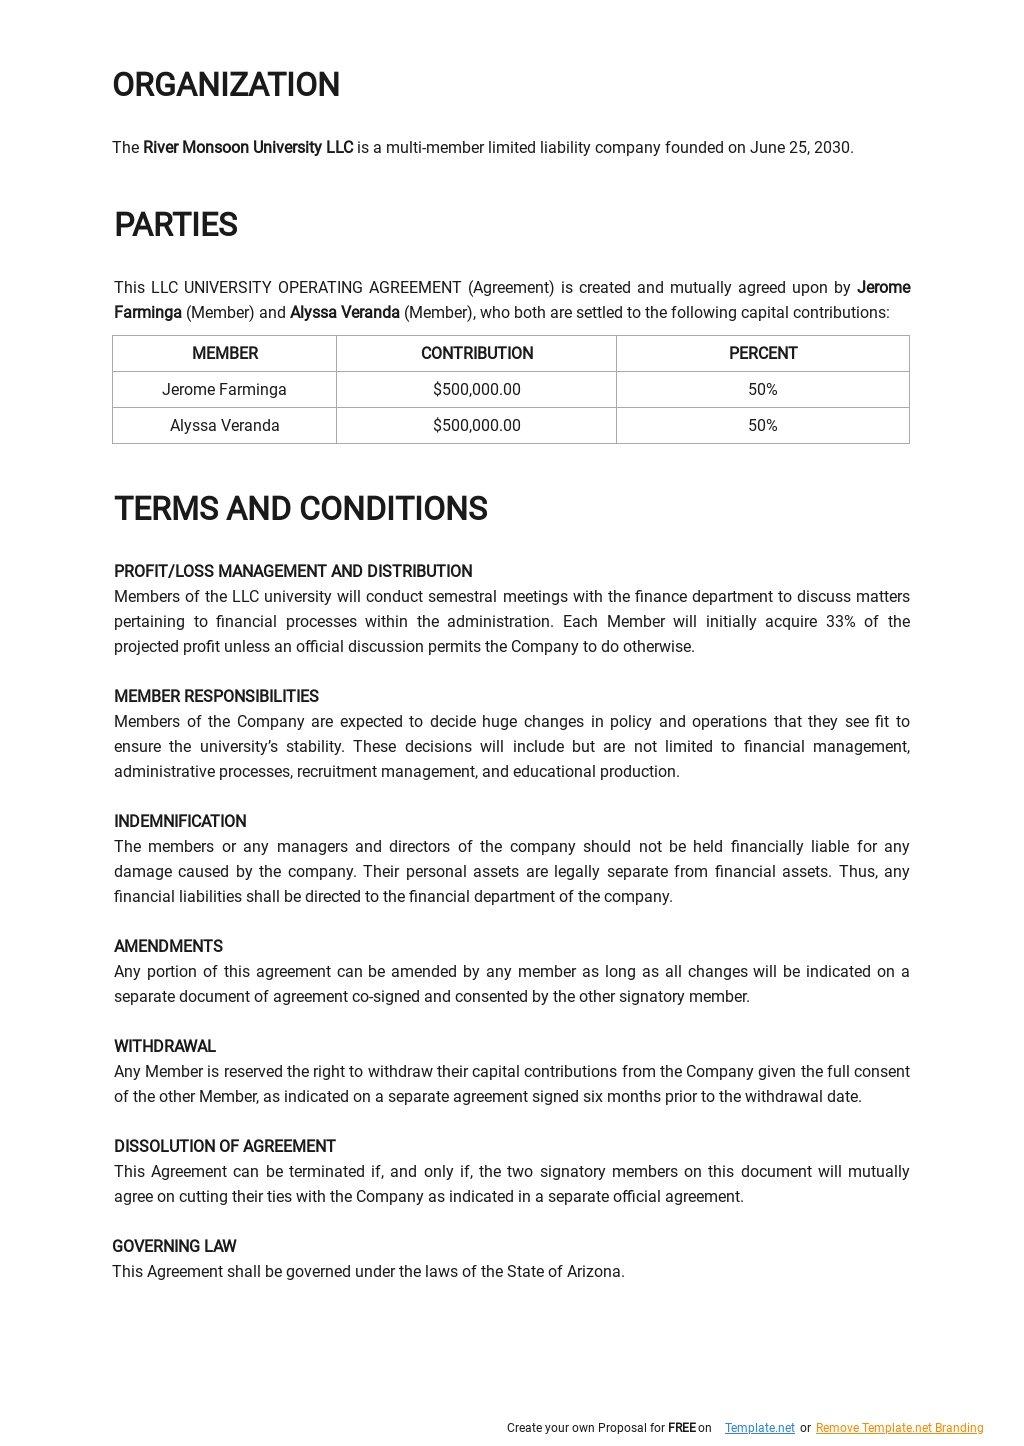 LLC University Operating Agreement Template 1.jpe